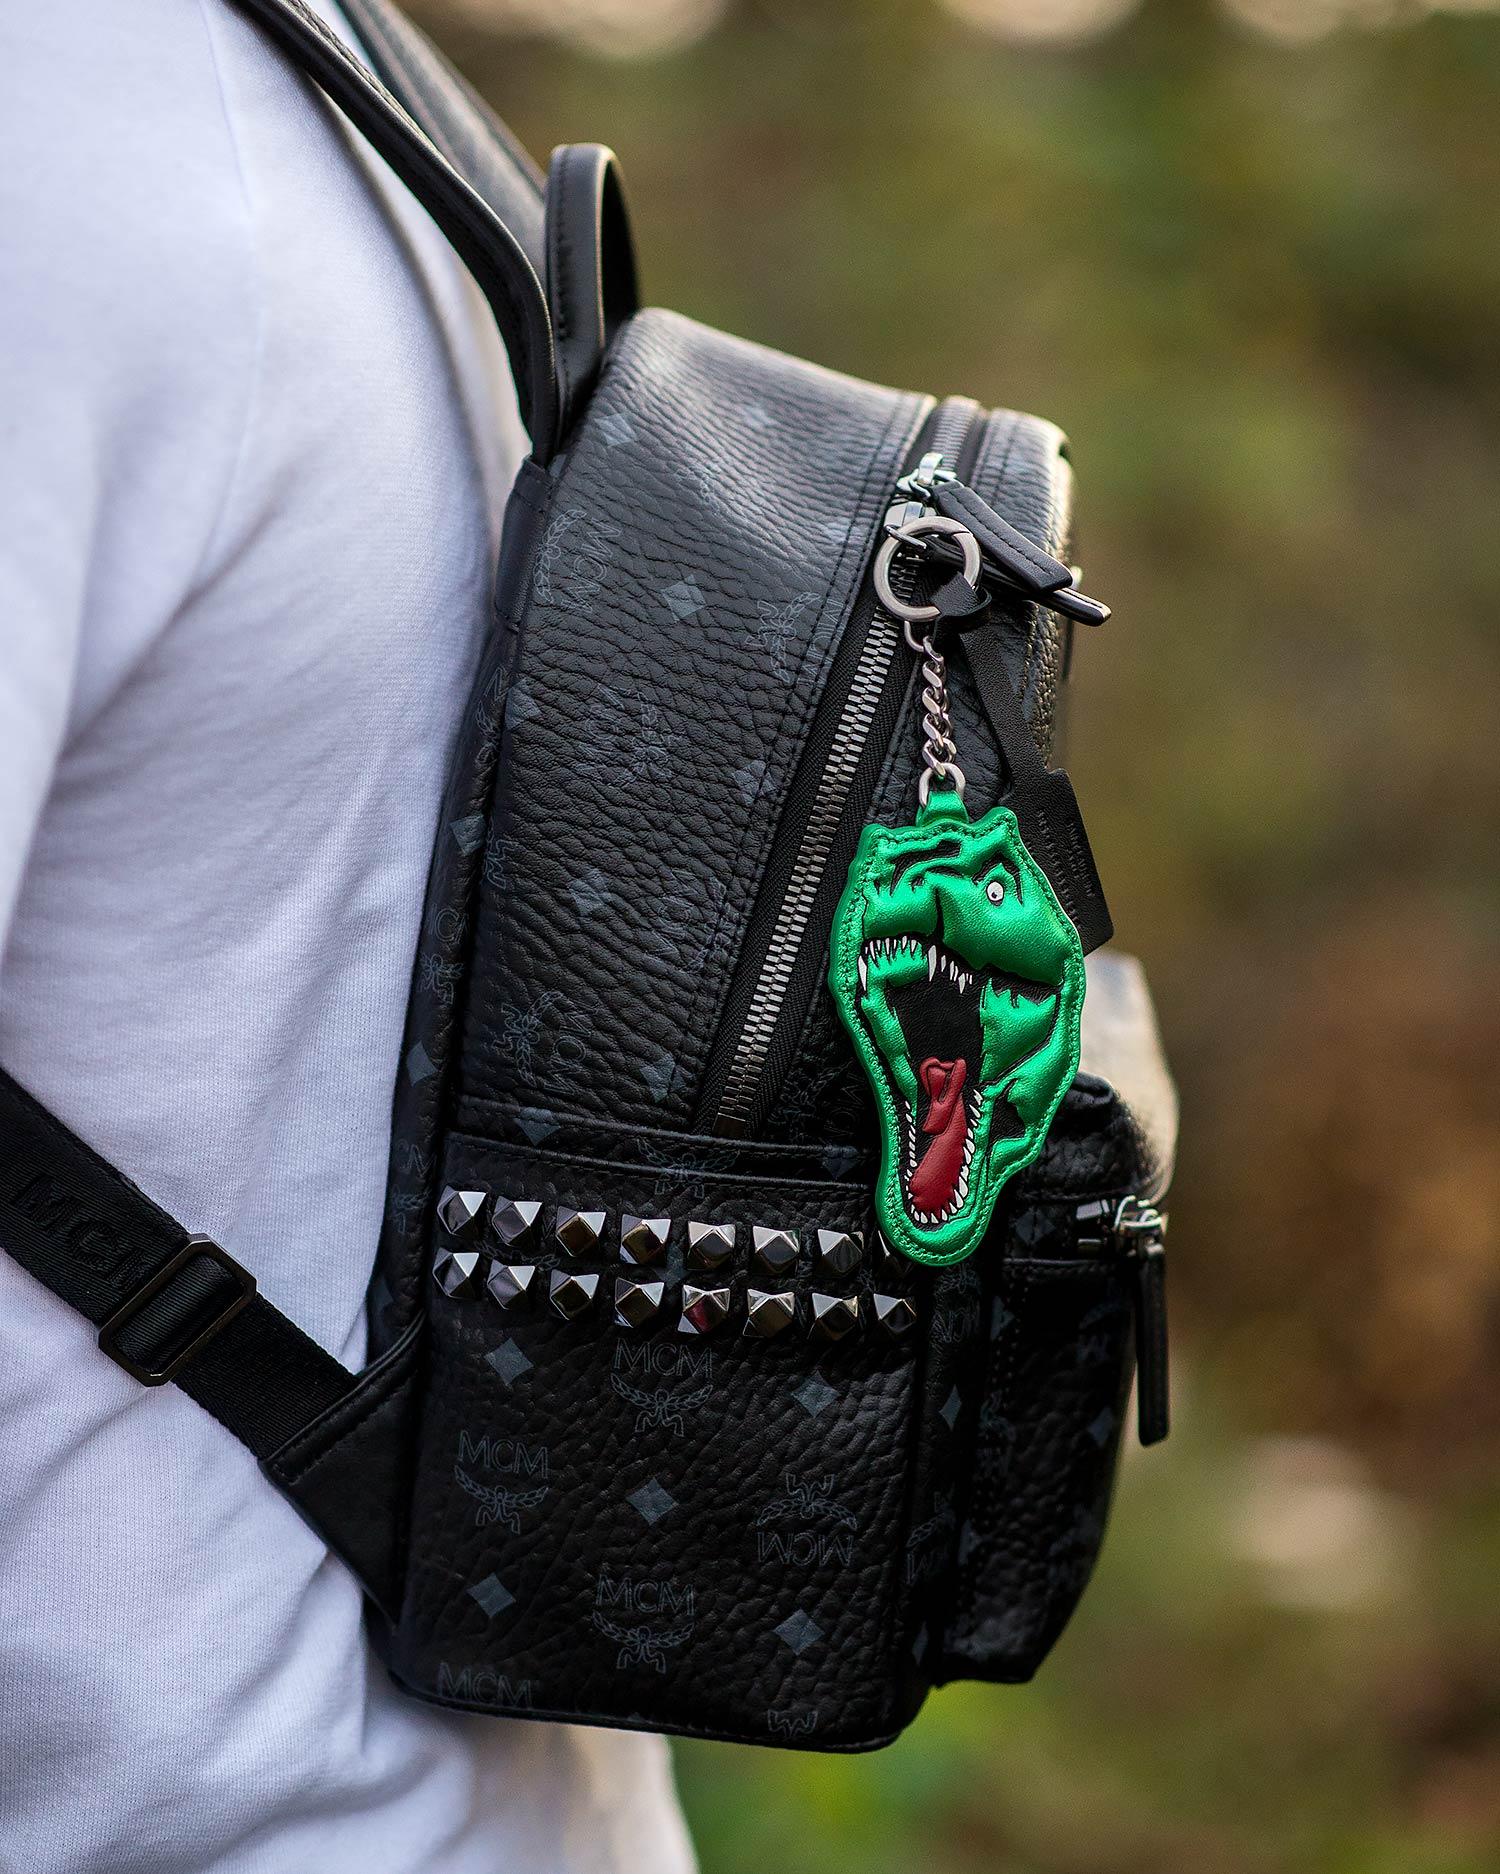 652c330cc Mcm Small Backpack Size- Fenix Toulouse Handball